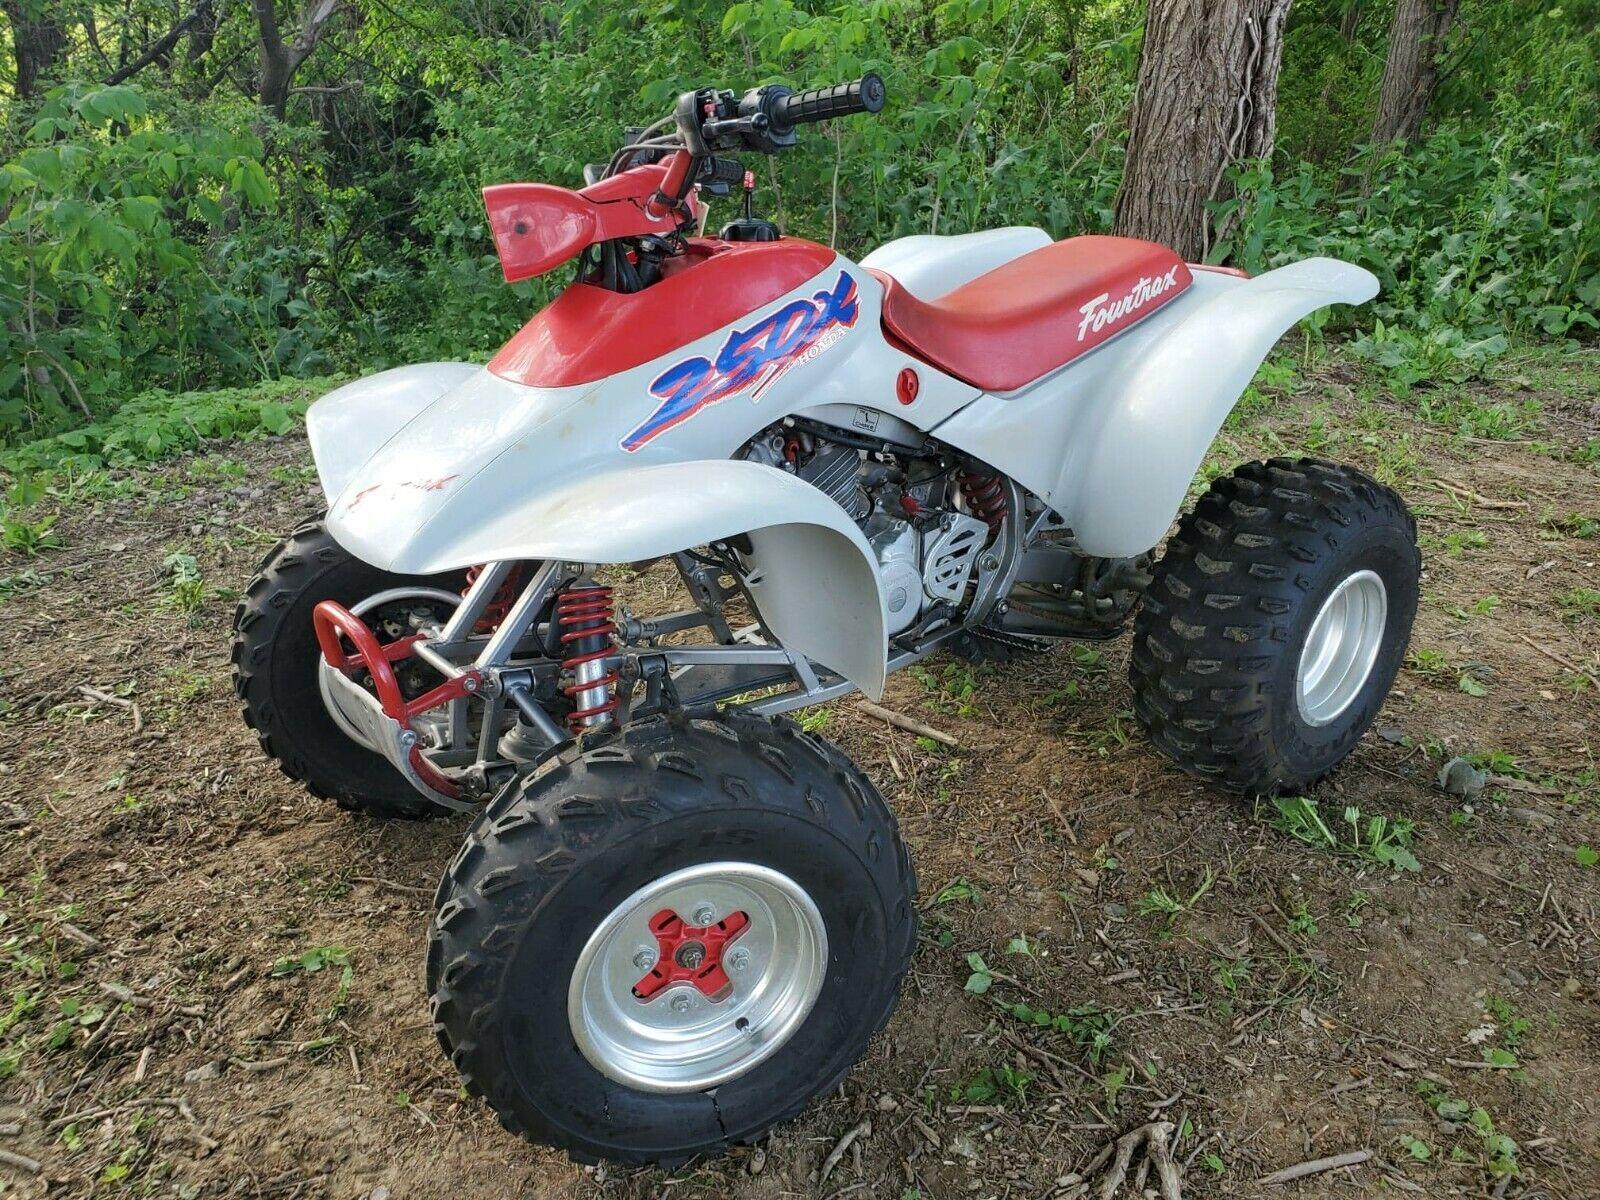 1987 HONDA TRX 250X - 4 WHEEL ATV - EXTREMELY ORIGINAL - MINT - RARE !